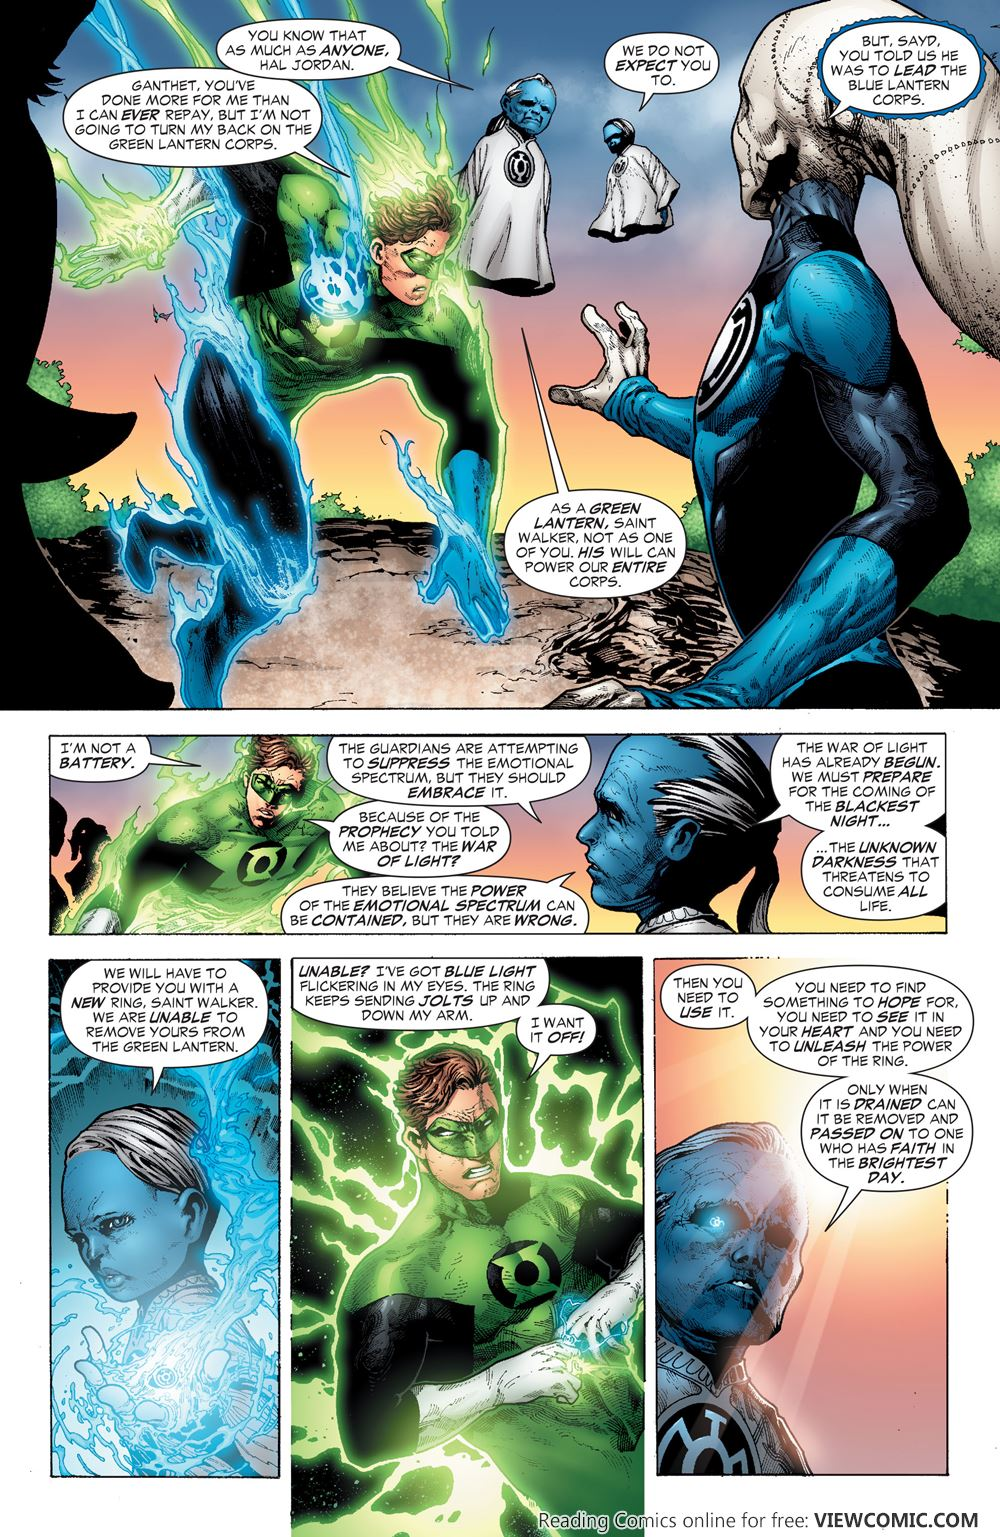 green lantern v4 039 2009 vietcomic net reading comics for free